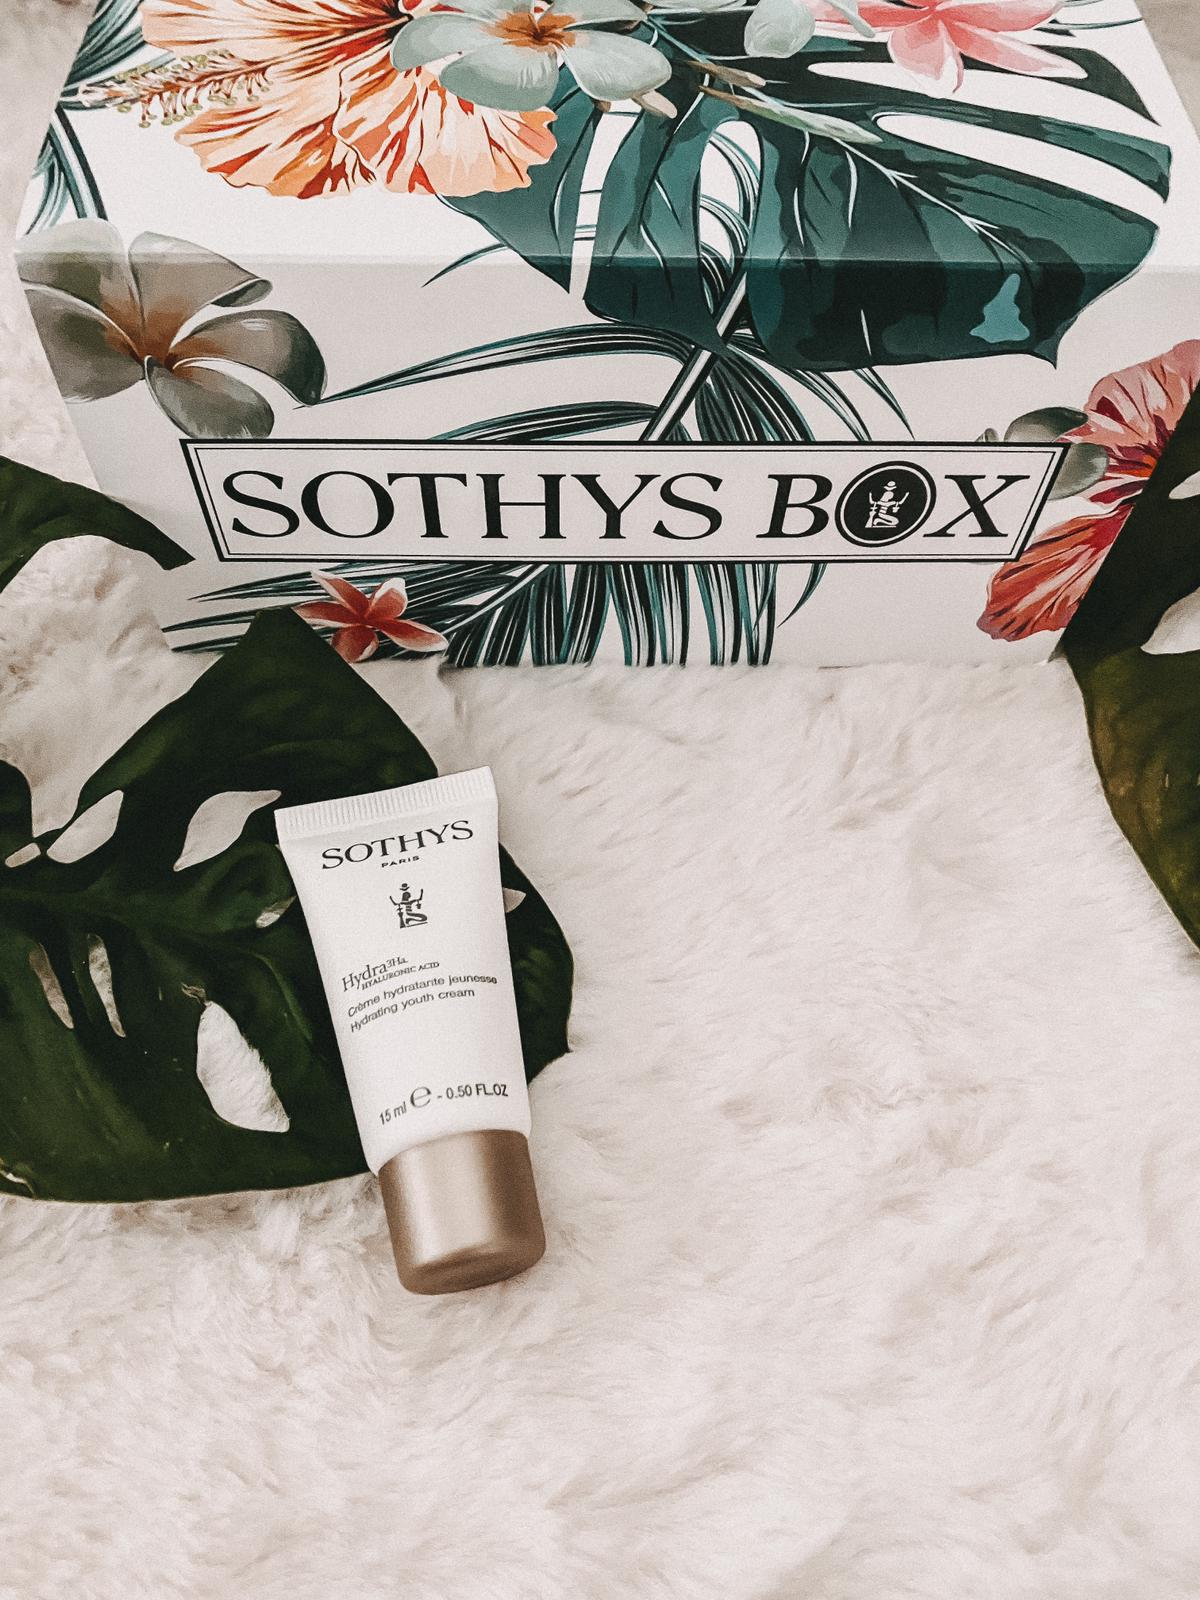 Sothys Box Sommer 2020 - Hydra 3Ha. Creme